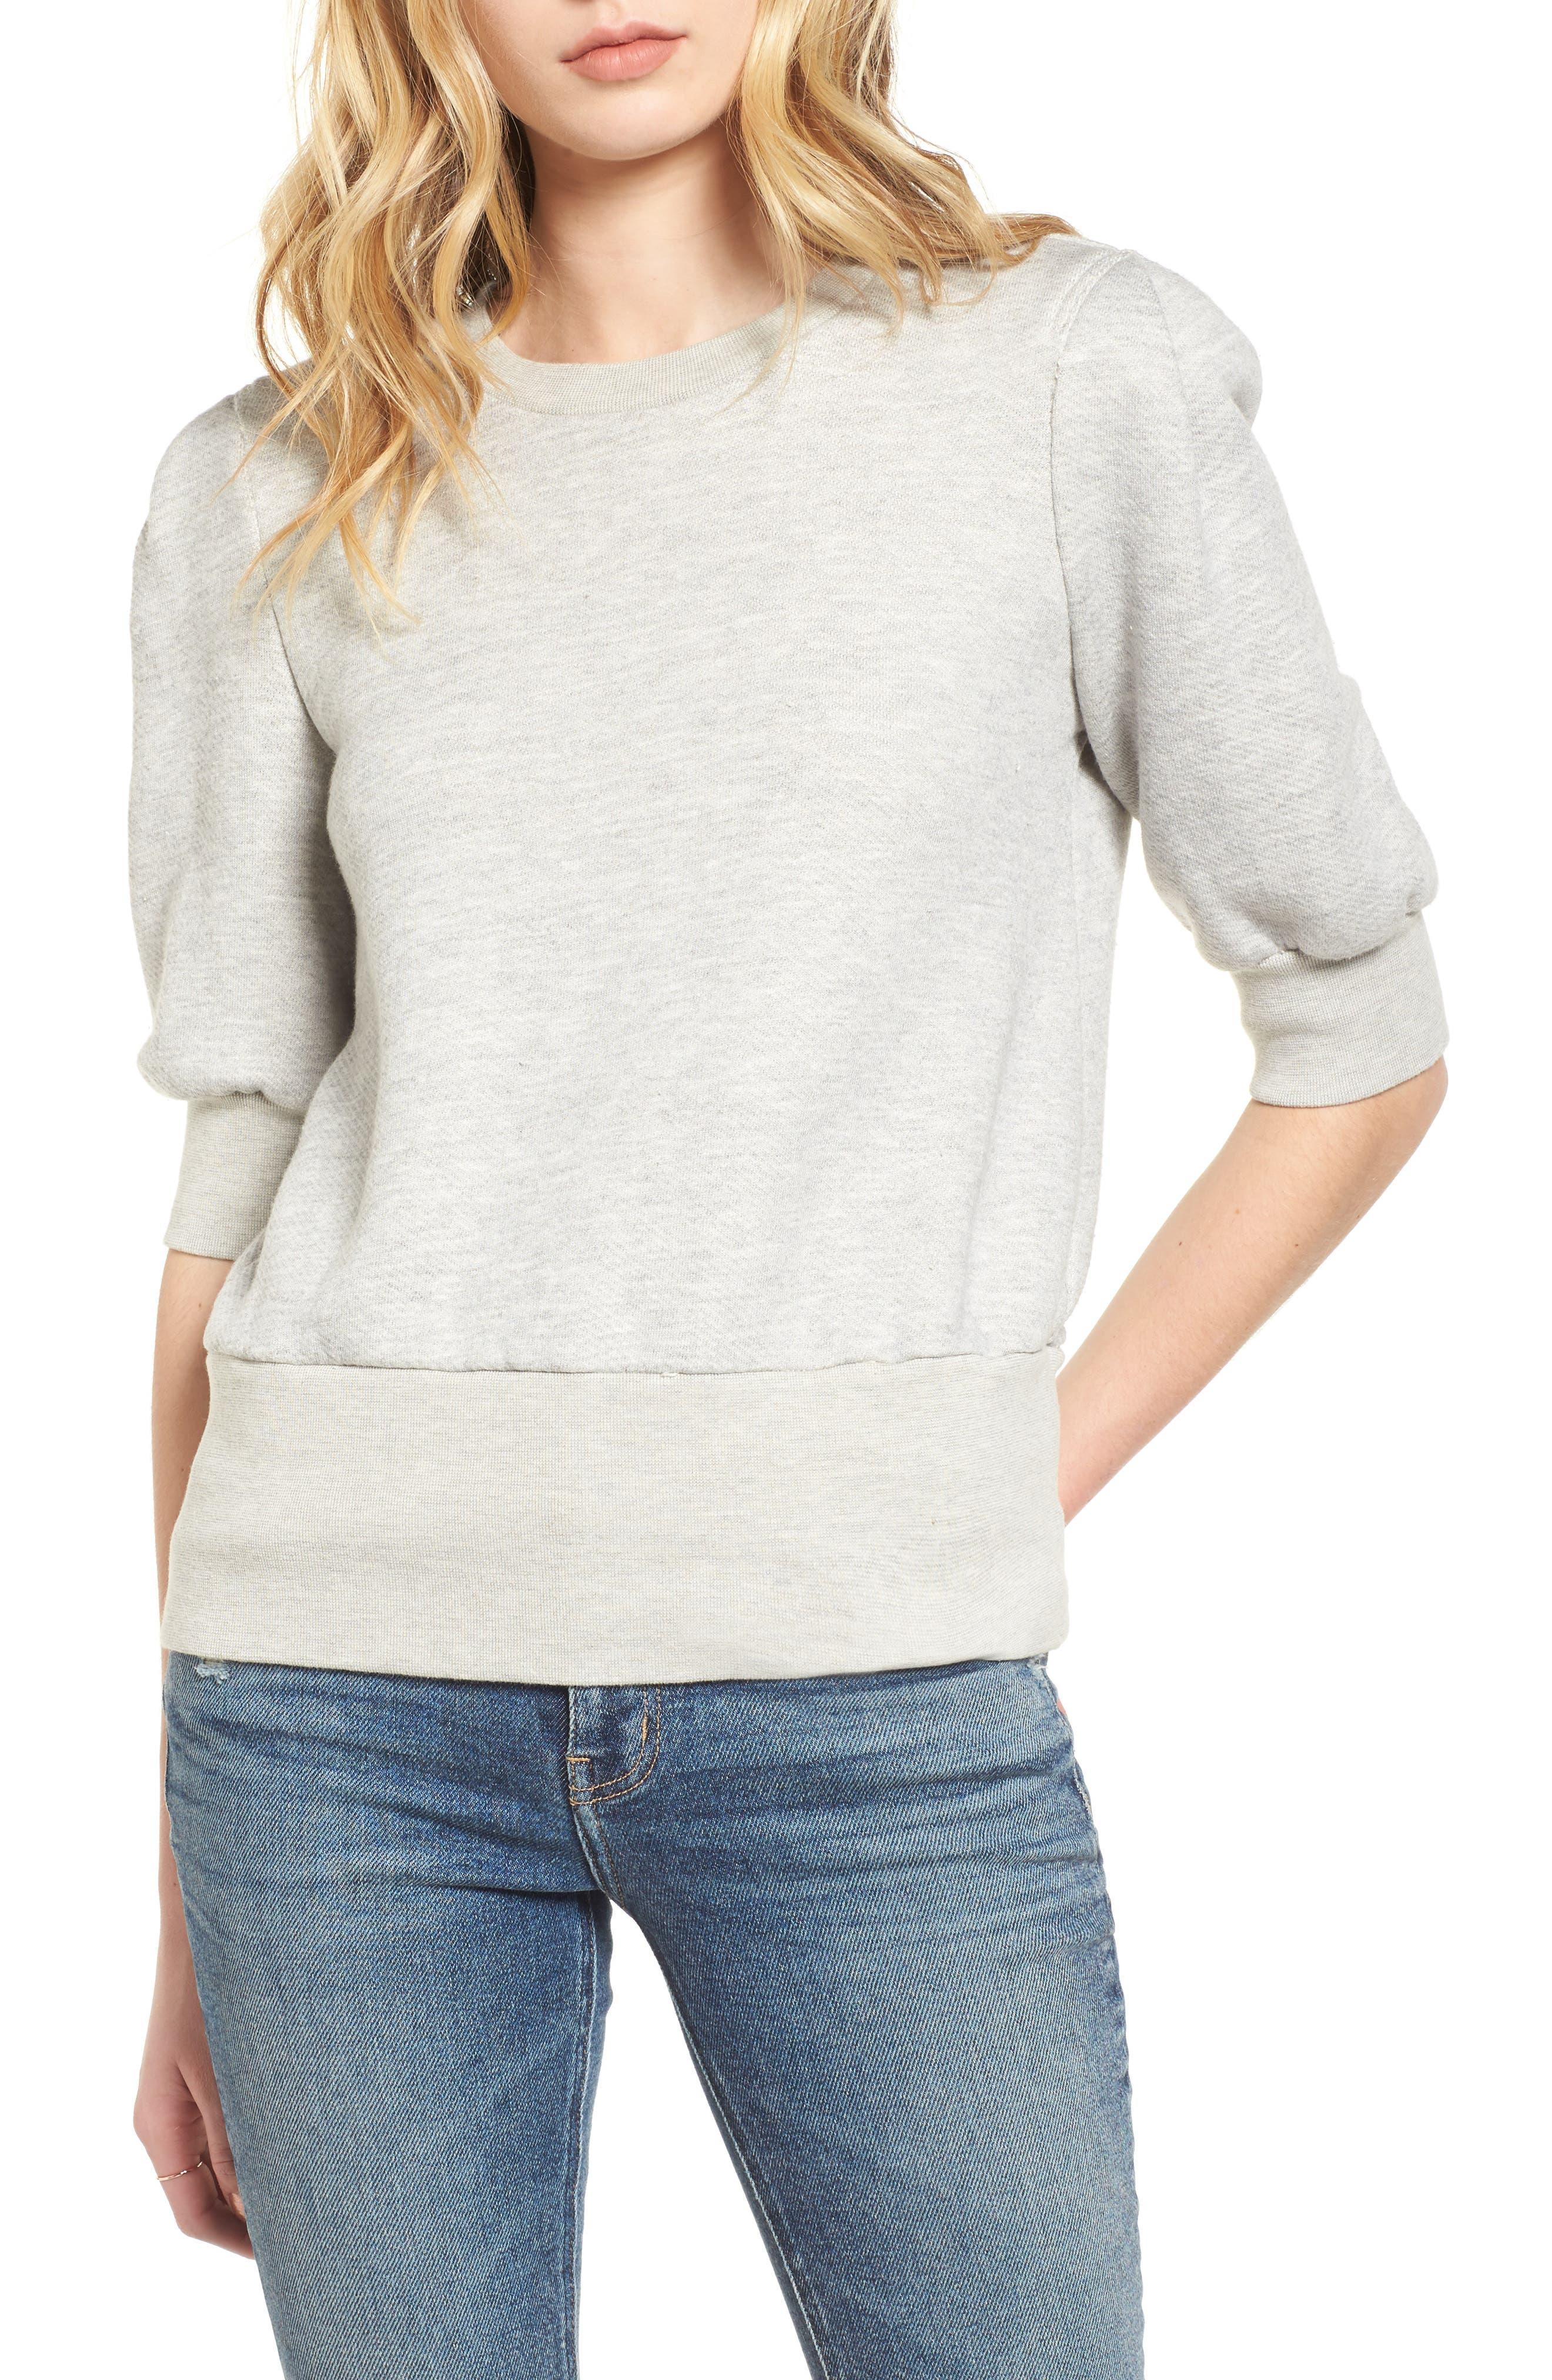 The Pleat Sweatshirt,                             Main thumbnail 1, color,                             Light Heather Grey Terry